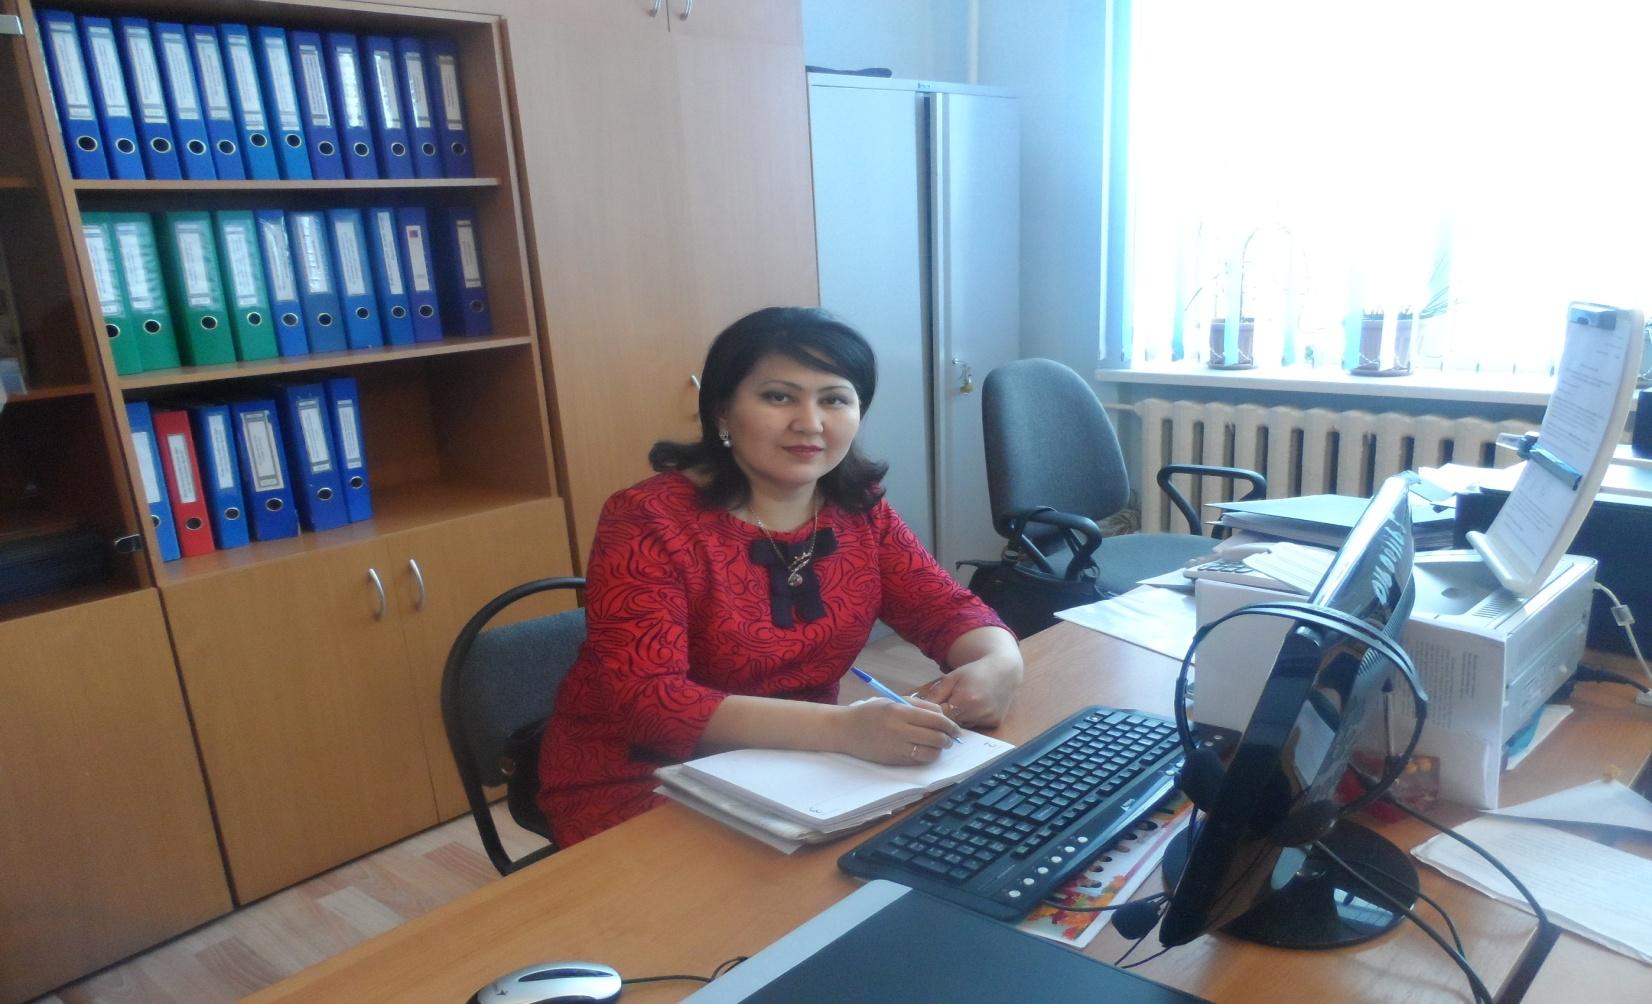 C:\Documents and Settings\Admin\Рабочий стол\фотолар\фото нач кл\SAM_4172.JPG